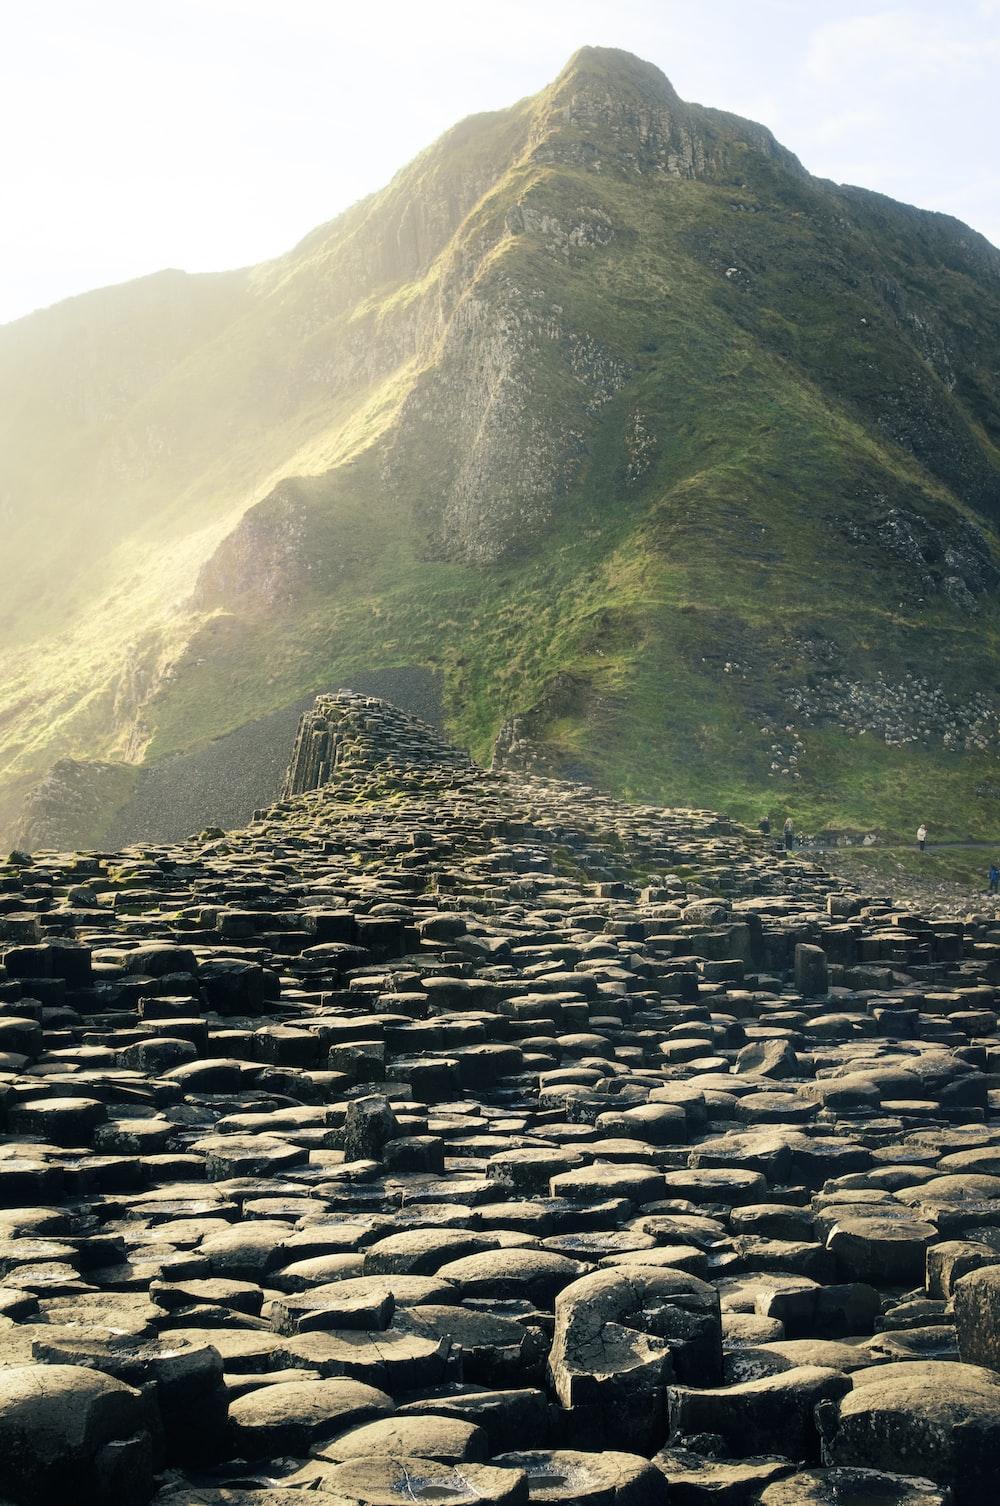 pile of rocks near on mountain